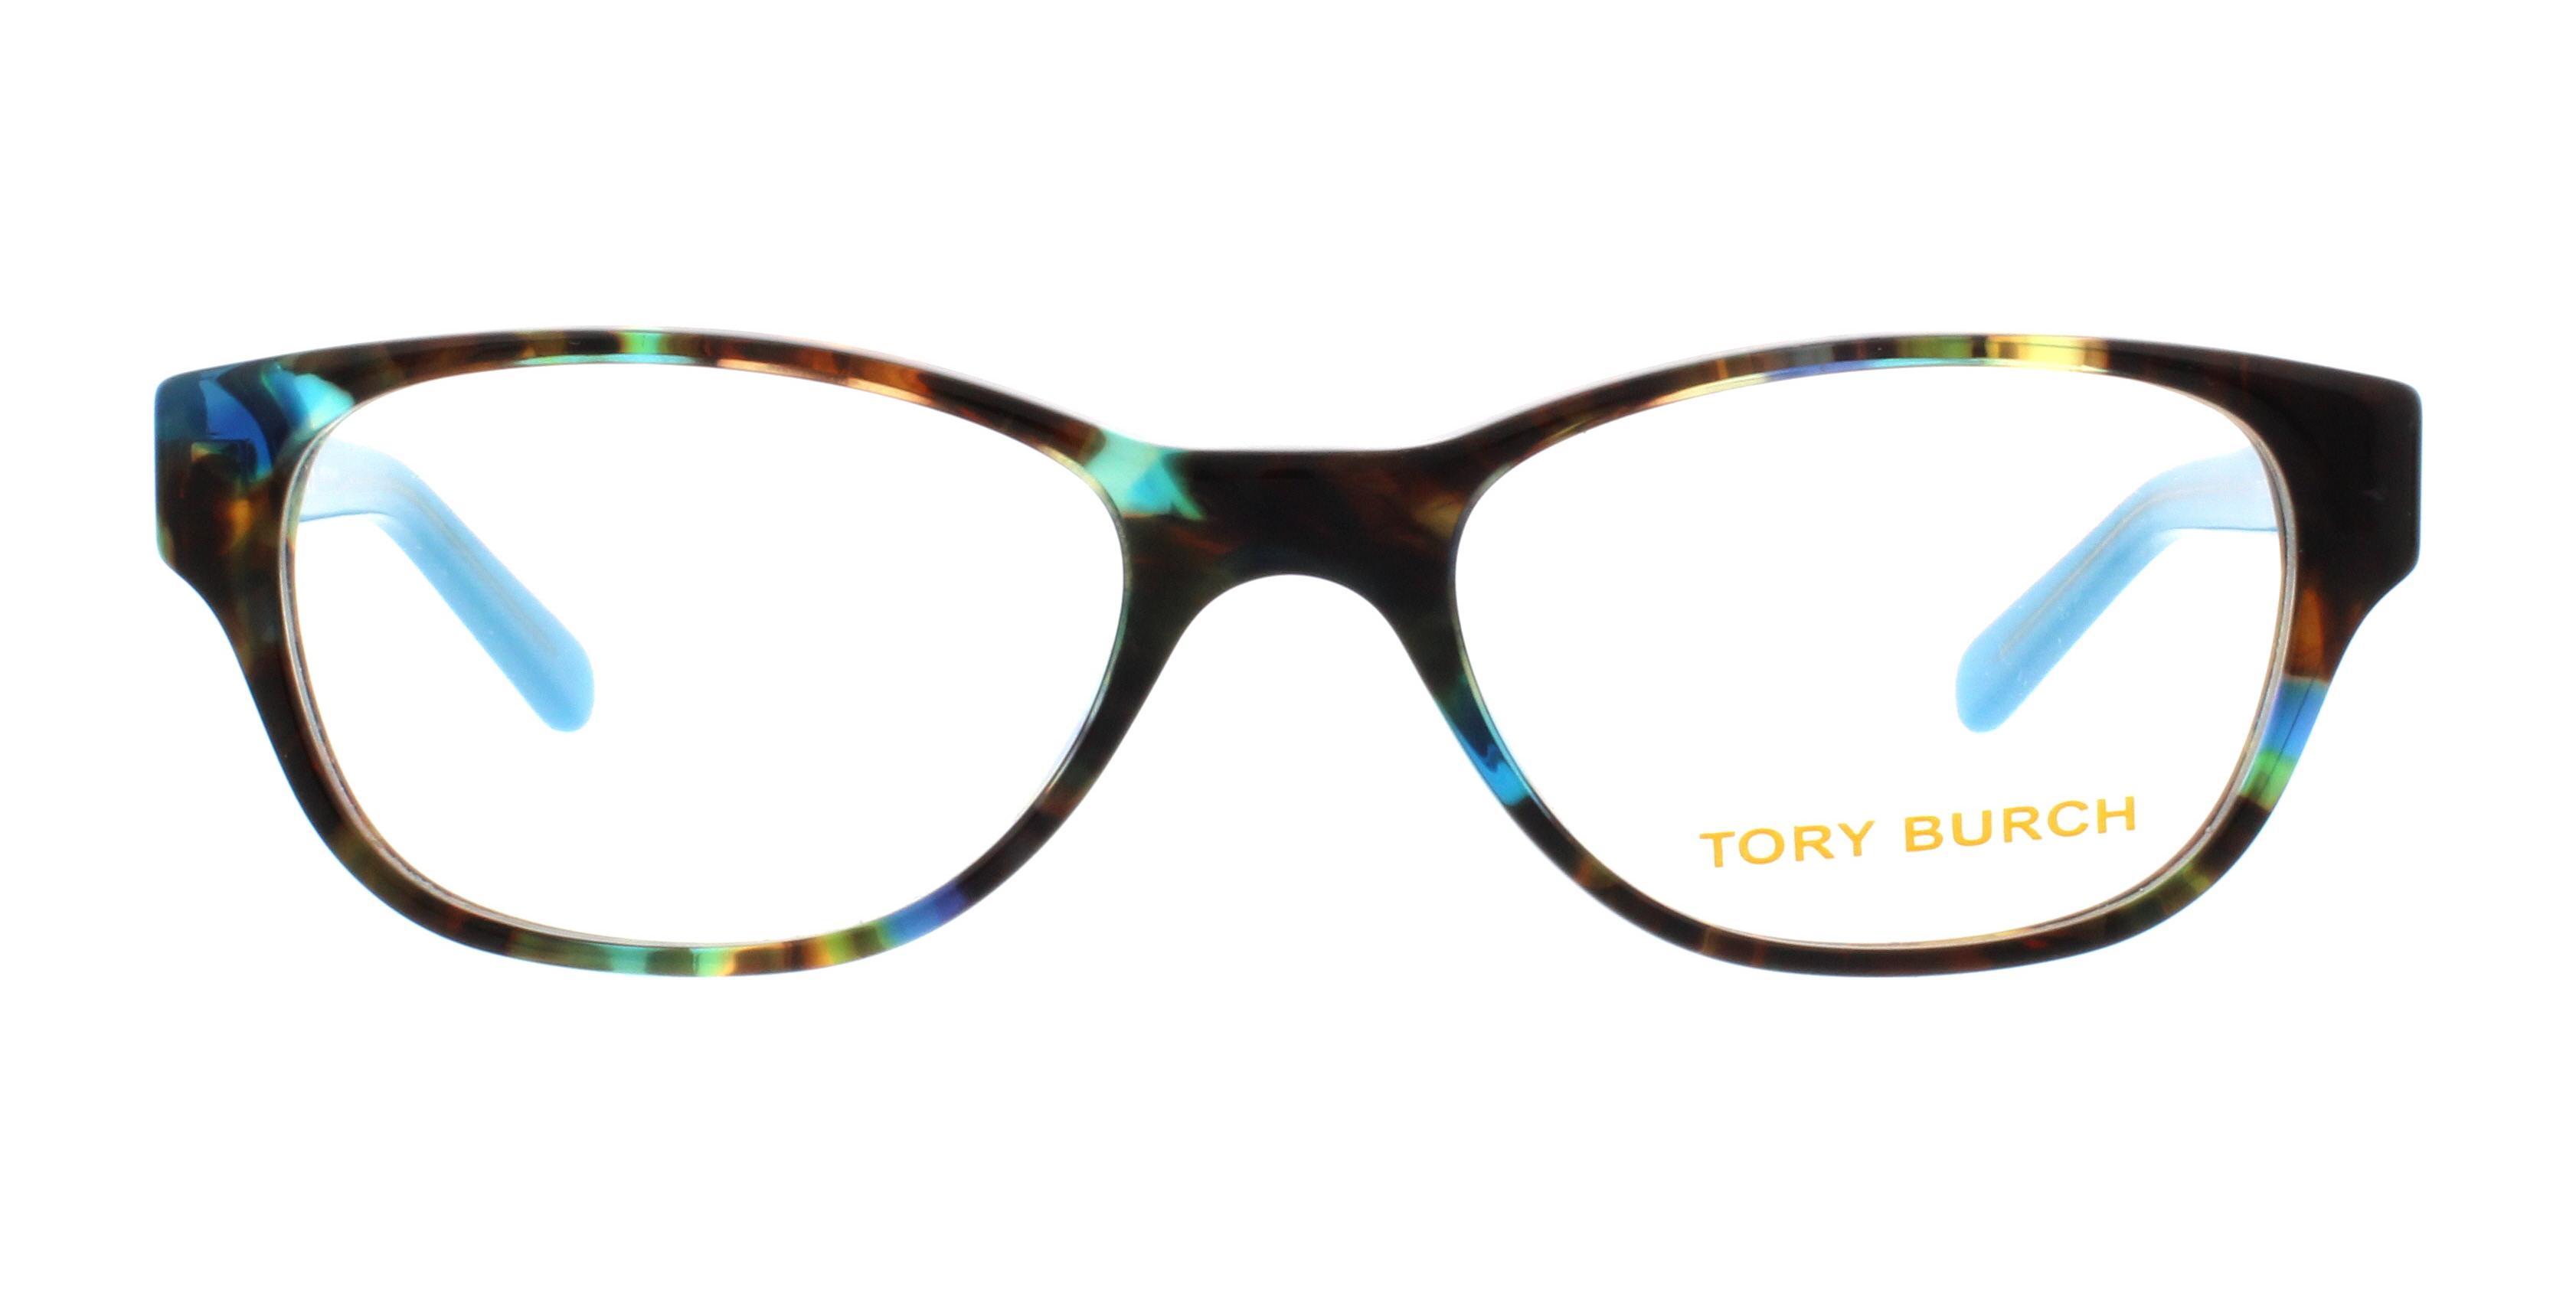 6103da16f5d2 Designer Frames Outlet. Tory Burch TY2031